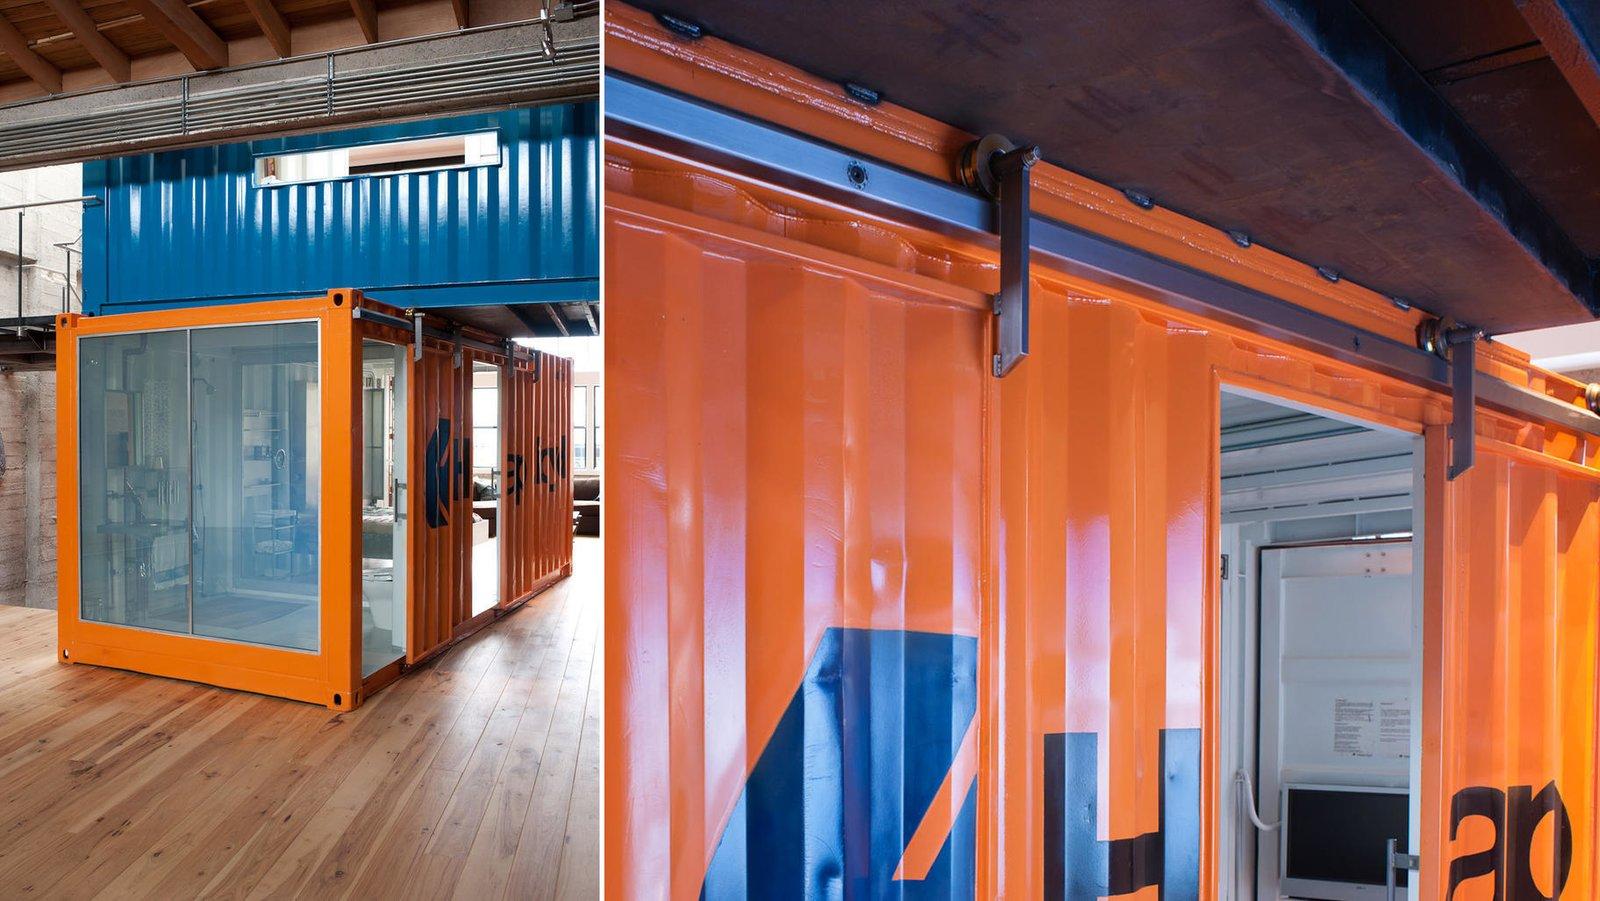 #lundberg #lundbergdesign #sanfrancisco #windows #glass #concrete #warehouse #interior #shippingcontainer #livingroom #shipping #container #hardwoodfloors #flooring  Wardell Sagan Residence by Lundberg Design